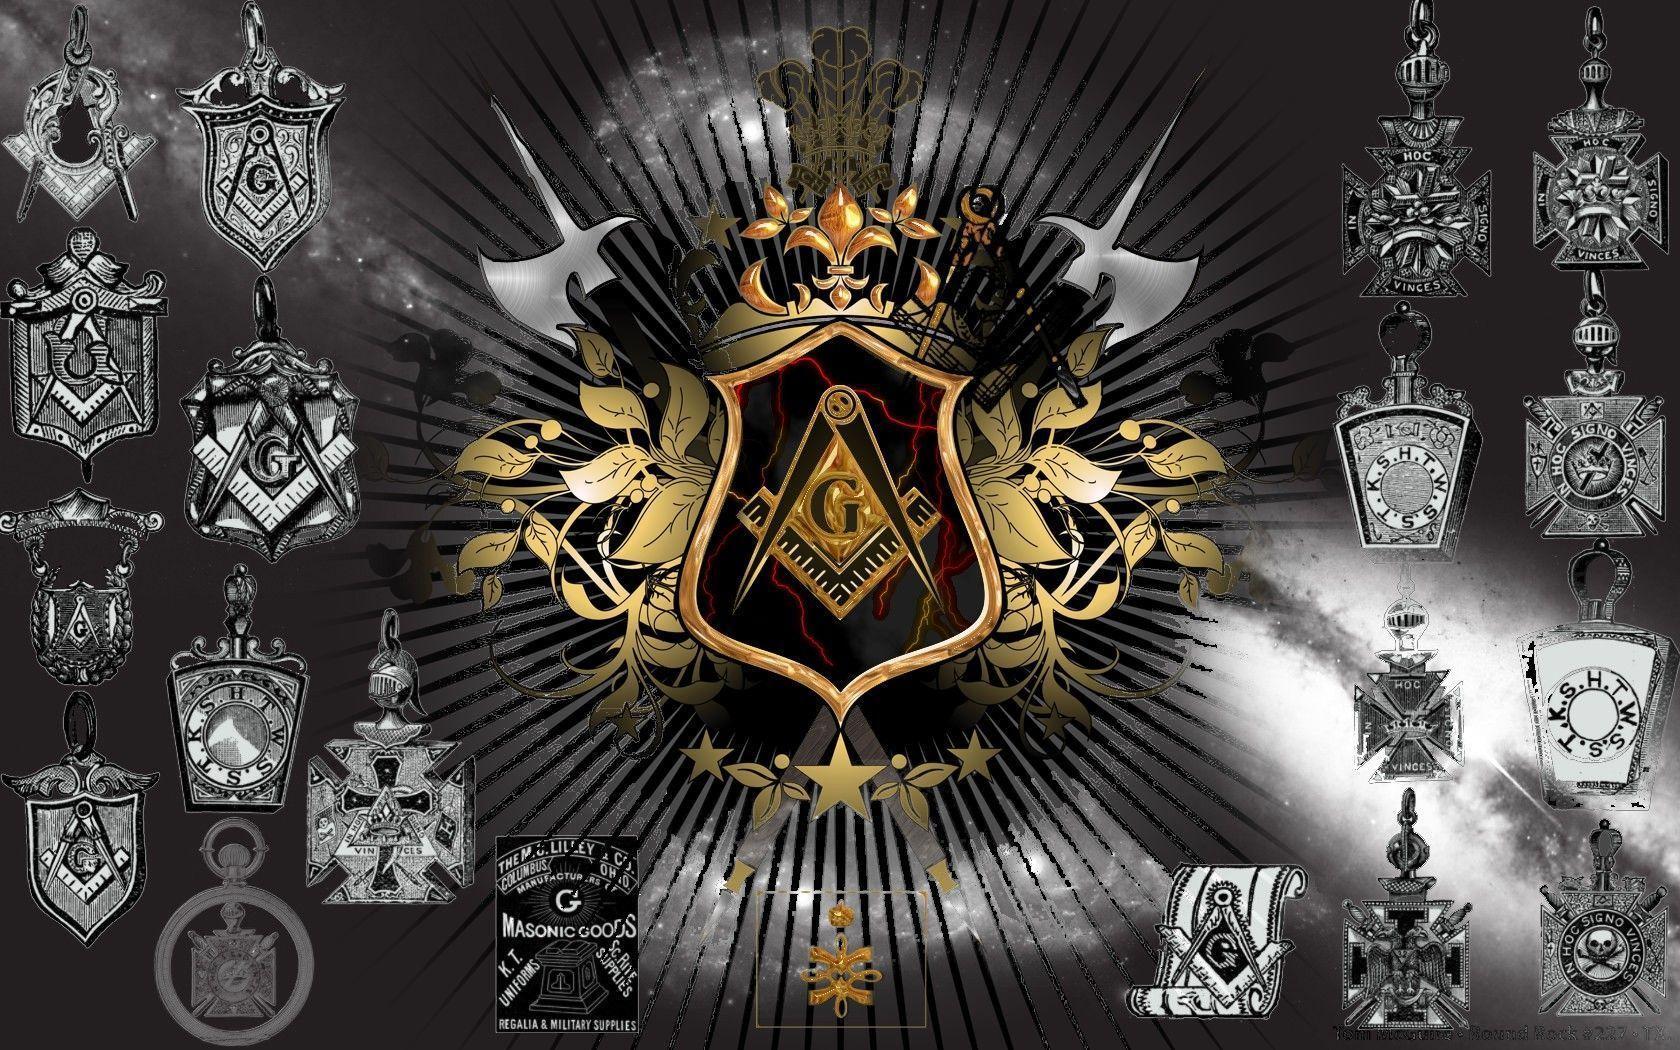 Wallpapers Freemason 1680x1050